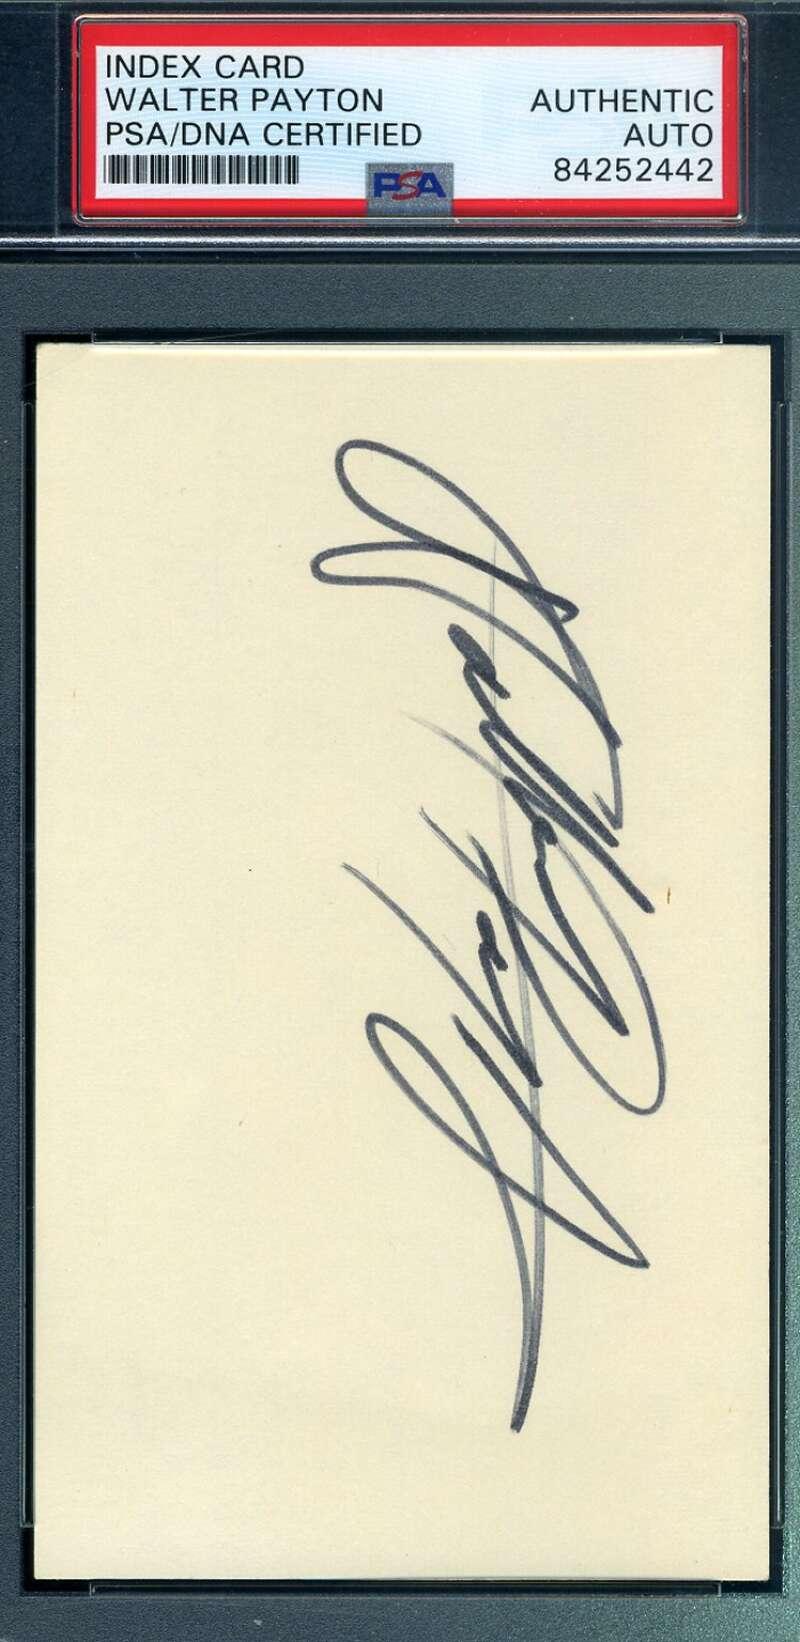 Walter Payton PSA DNA Coa Hand Signed 3x5 Football Index Card Autograph